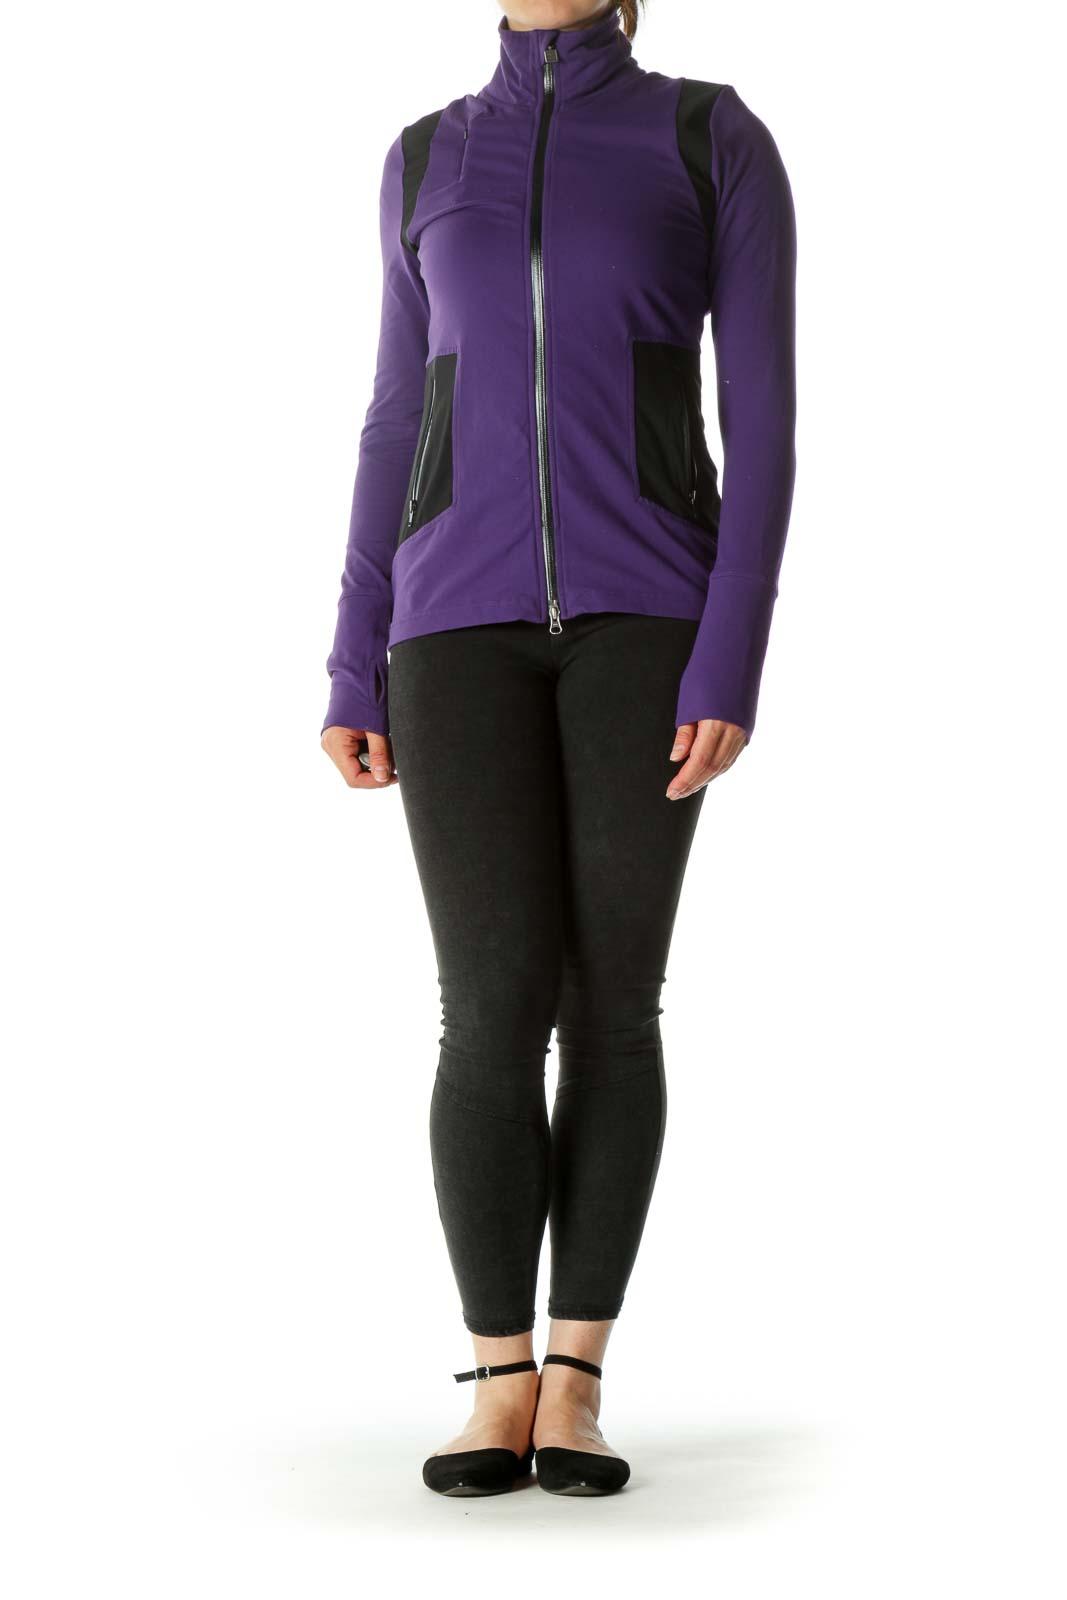 Purple & black Thumb-Holed Double Zippered Sports Jackets